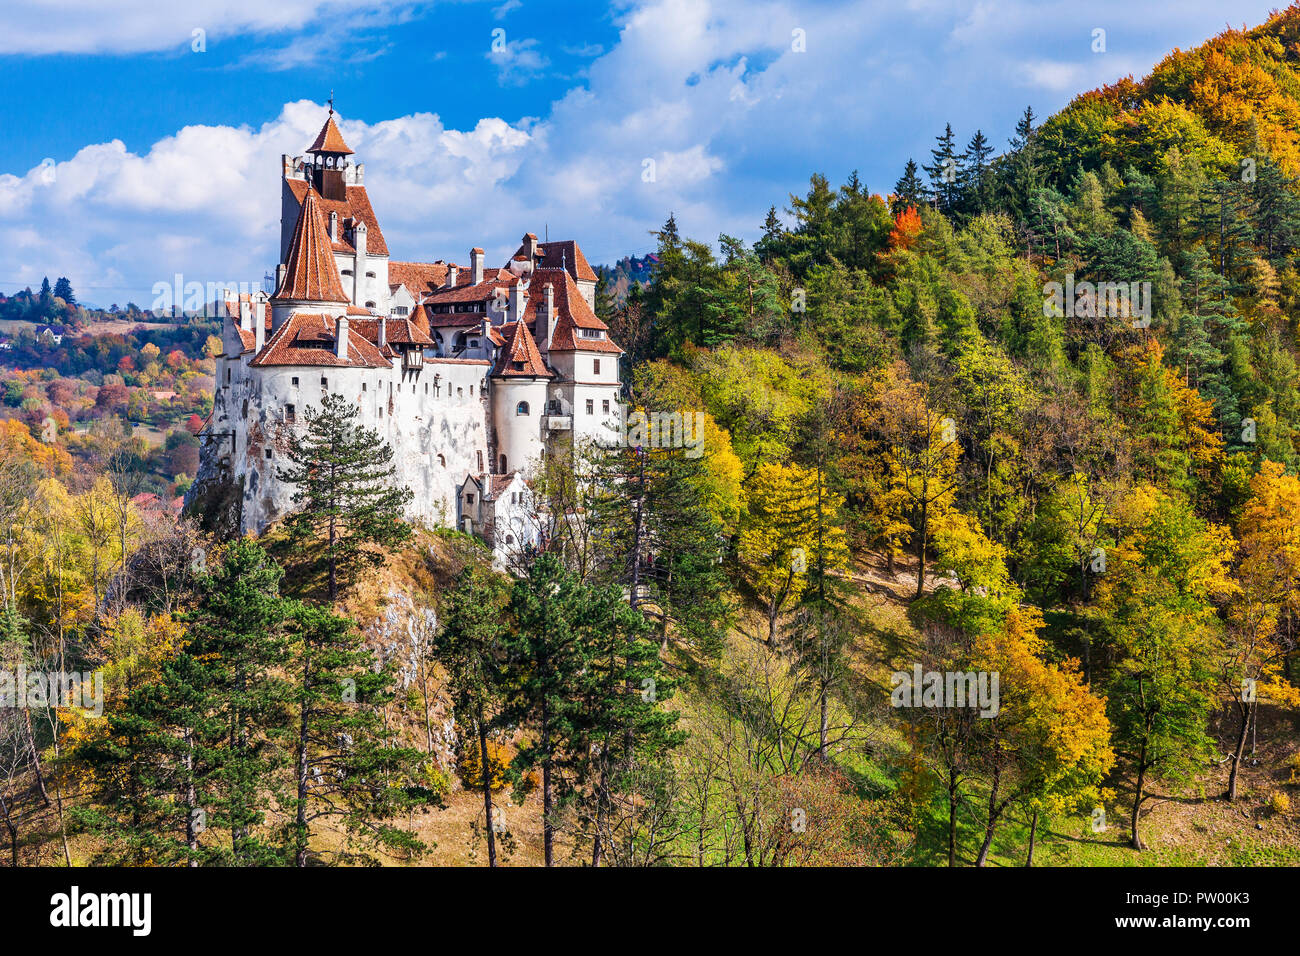 Brasov, Transylvania. Romania. The medieval Castle of Bran, known for the myth of Dracula. Stock Photo